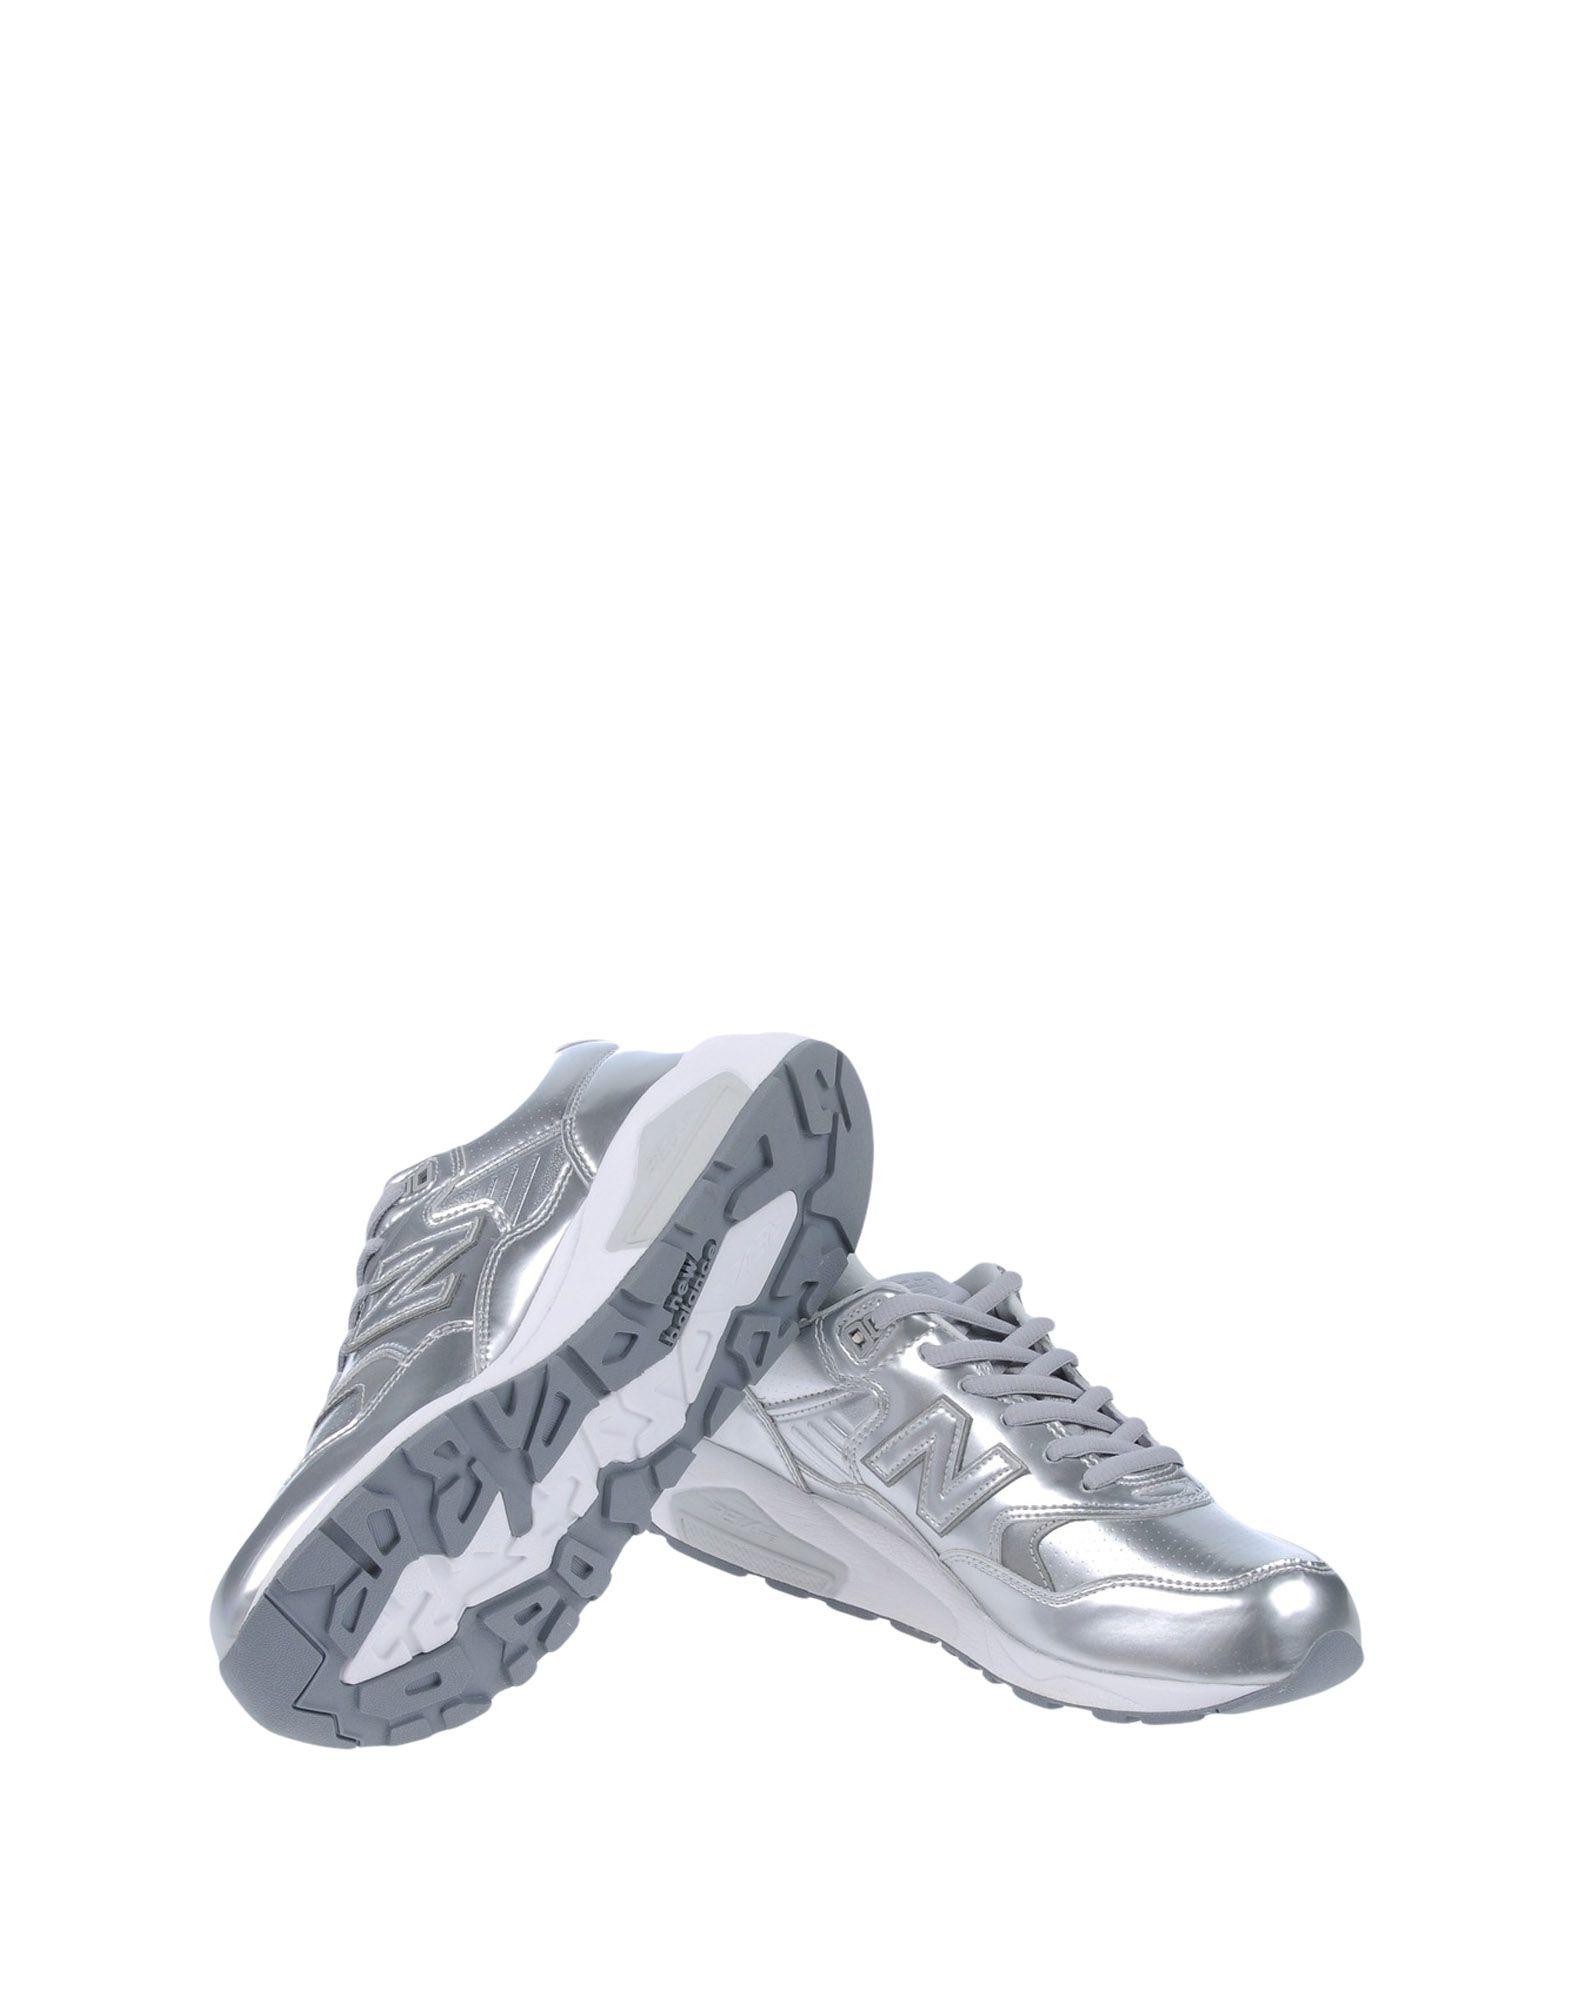 Sneakers New Balance New Balance 580 - Donna - 11158287GD